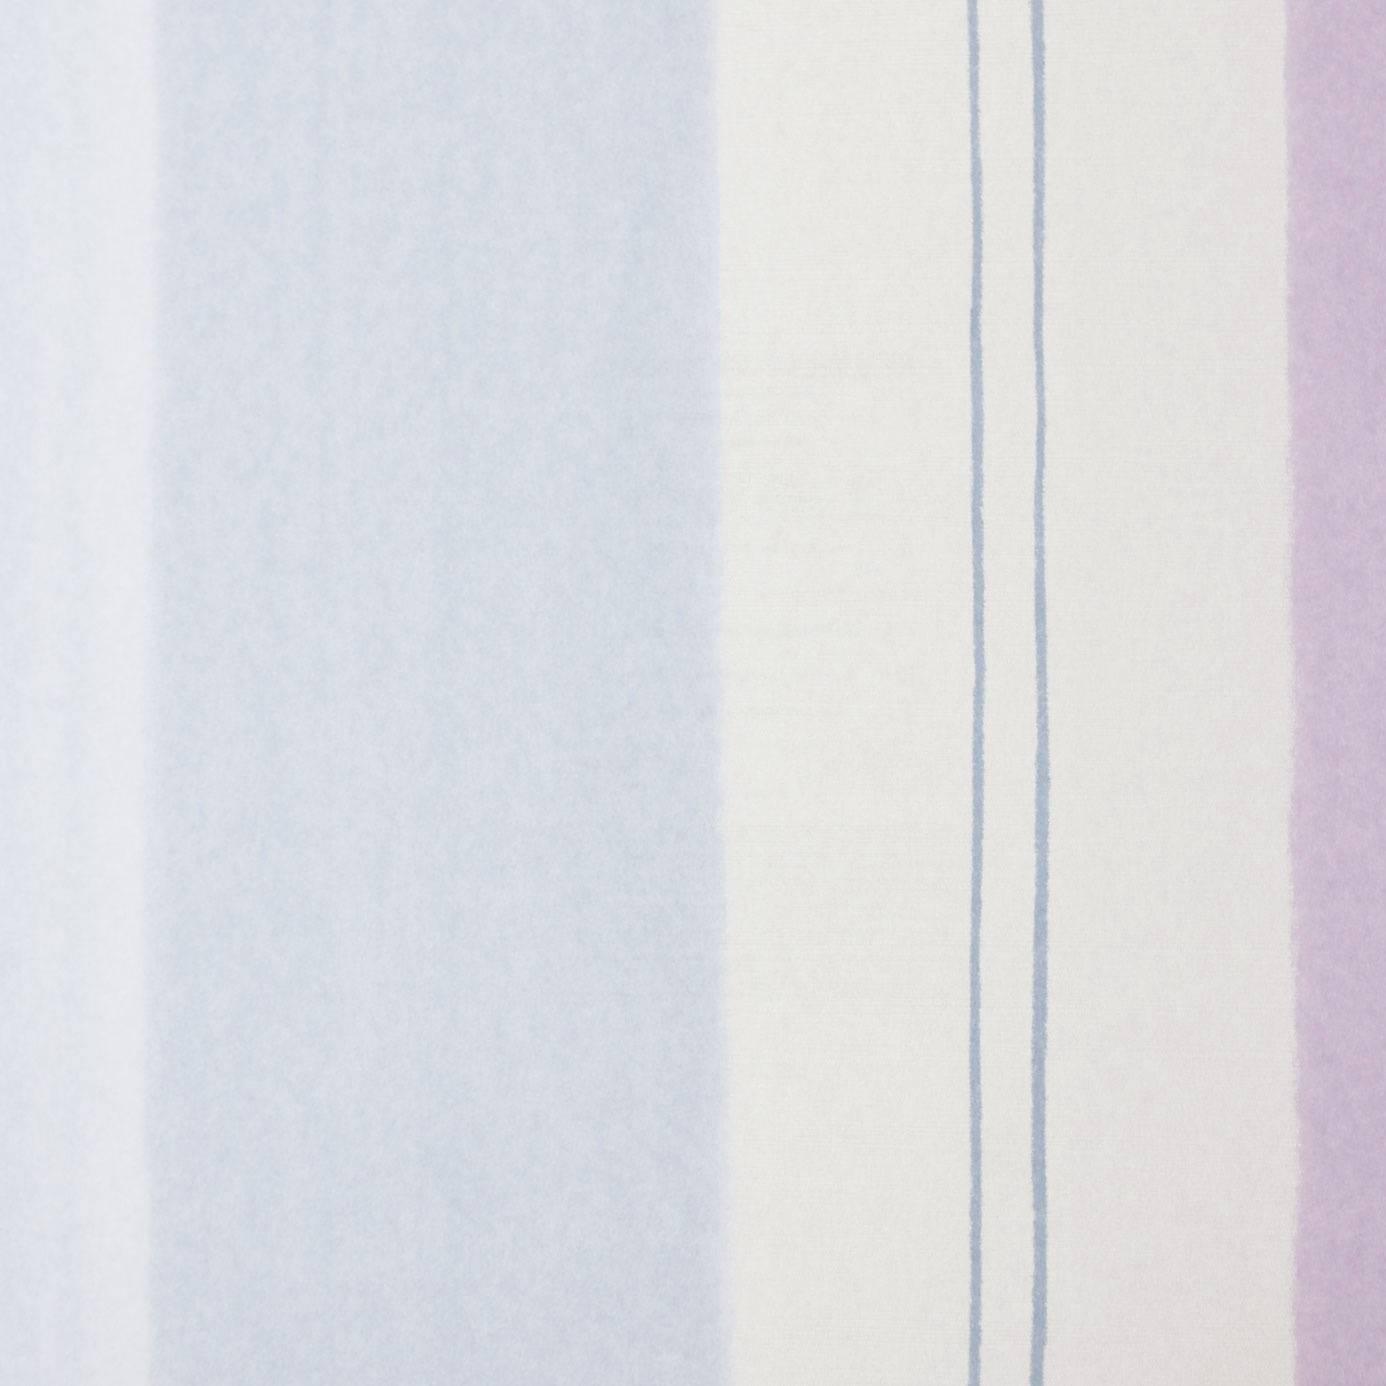 Pintura wallpaper blue grey purple 72250515 camengo for Purple and grey wallpaper